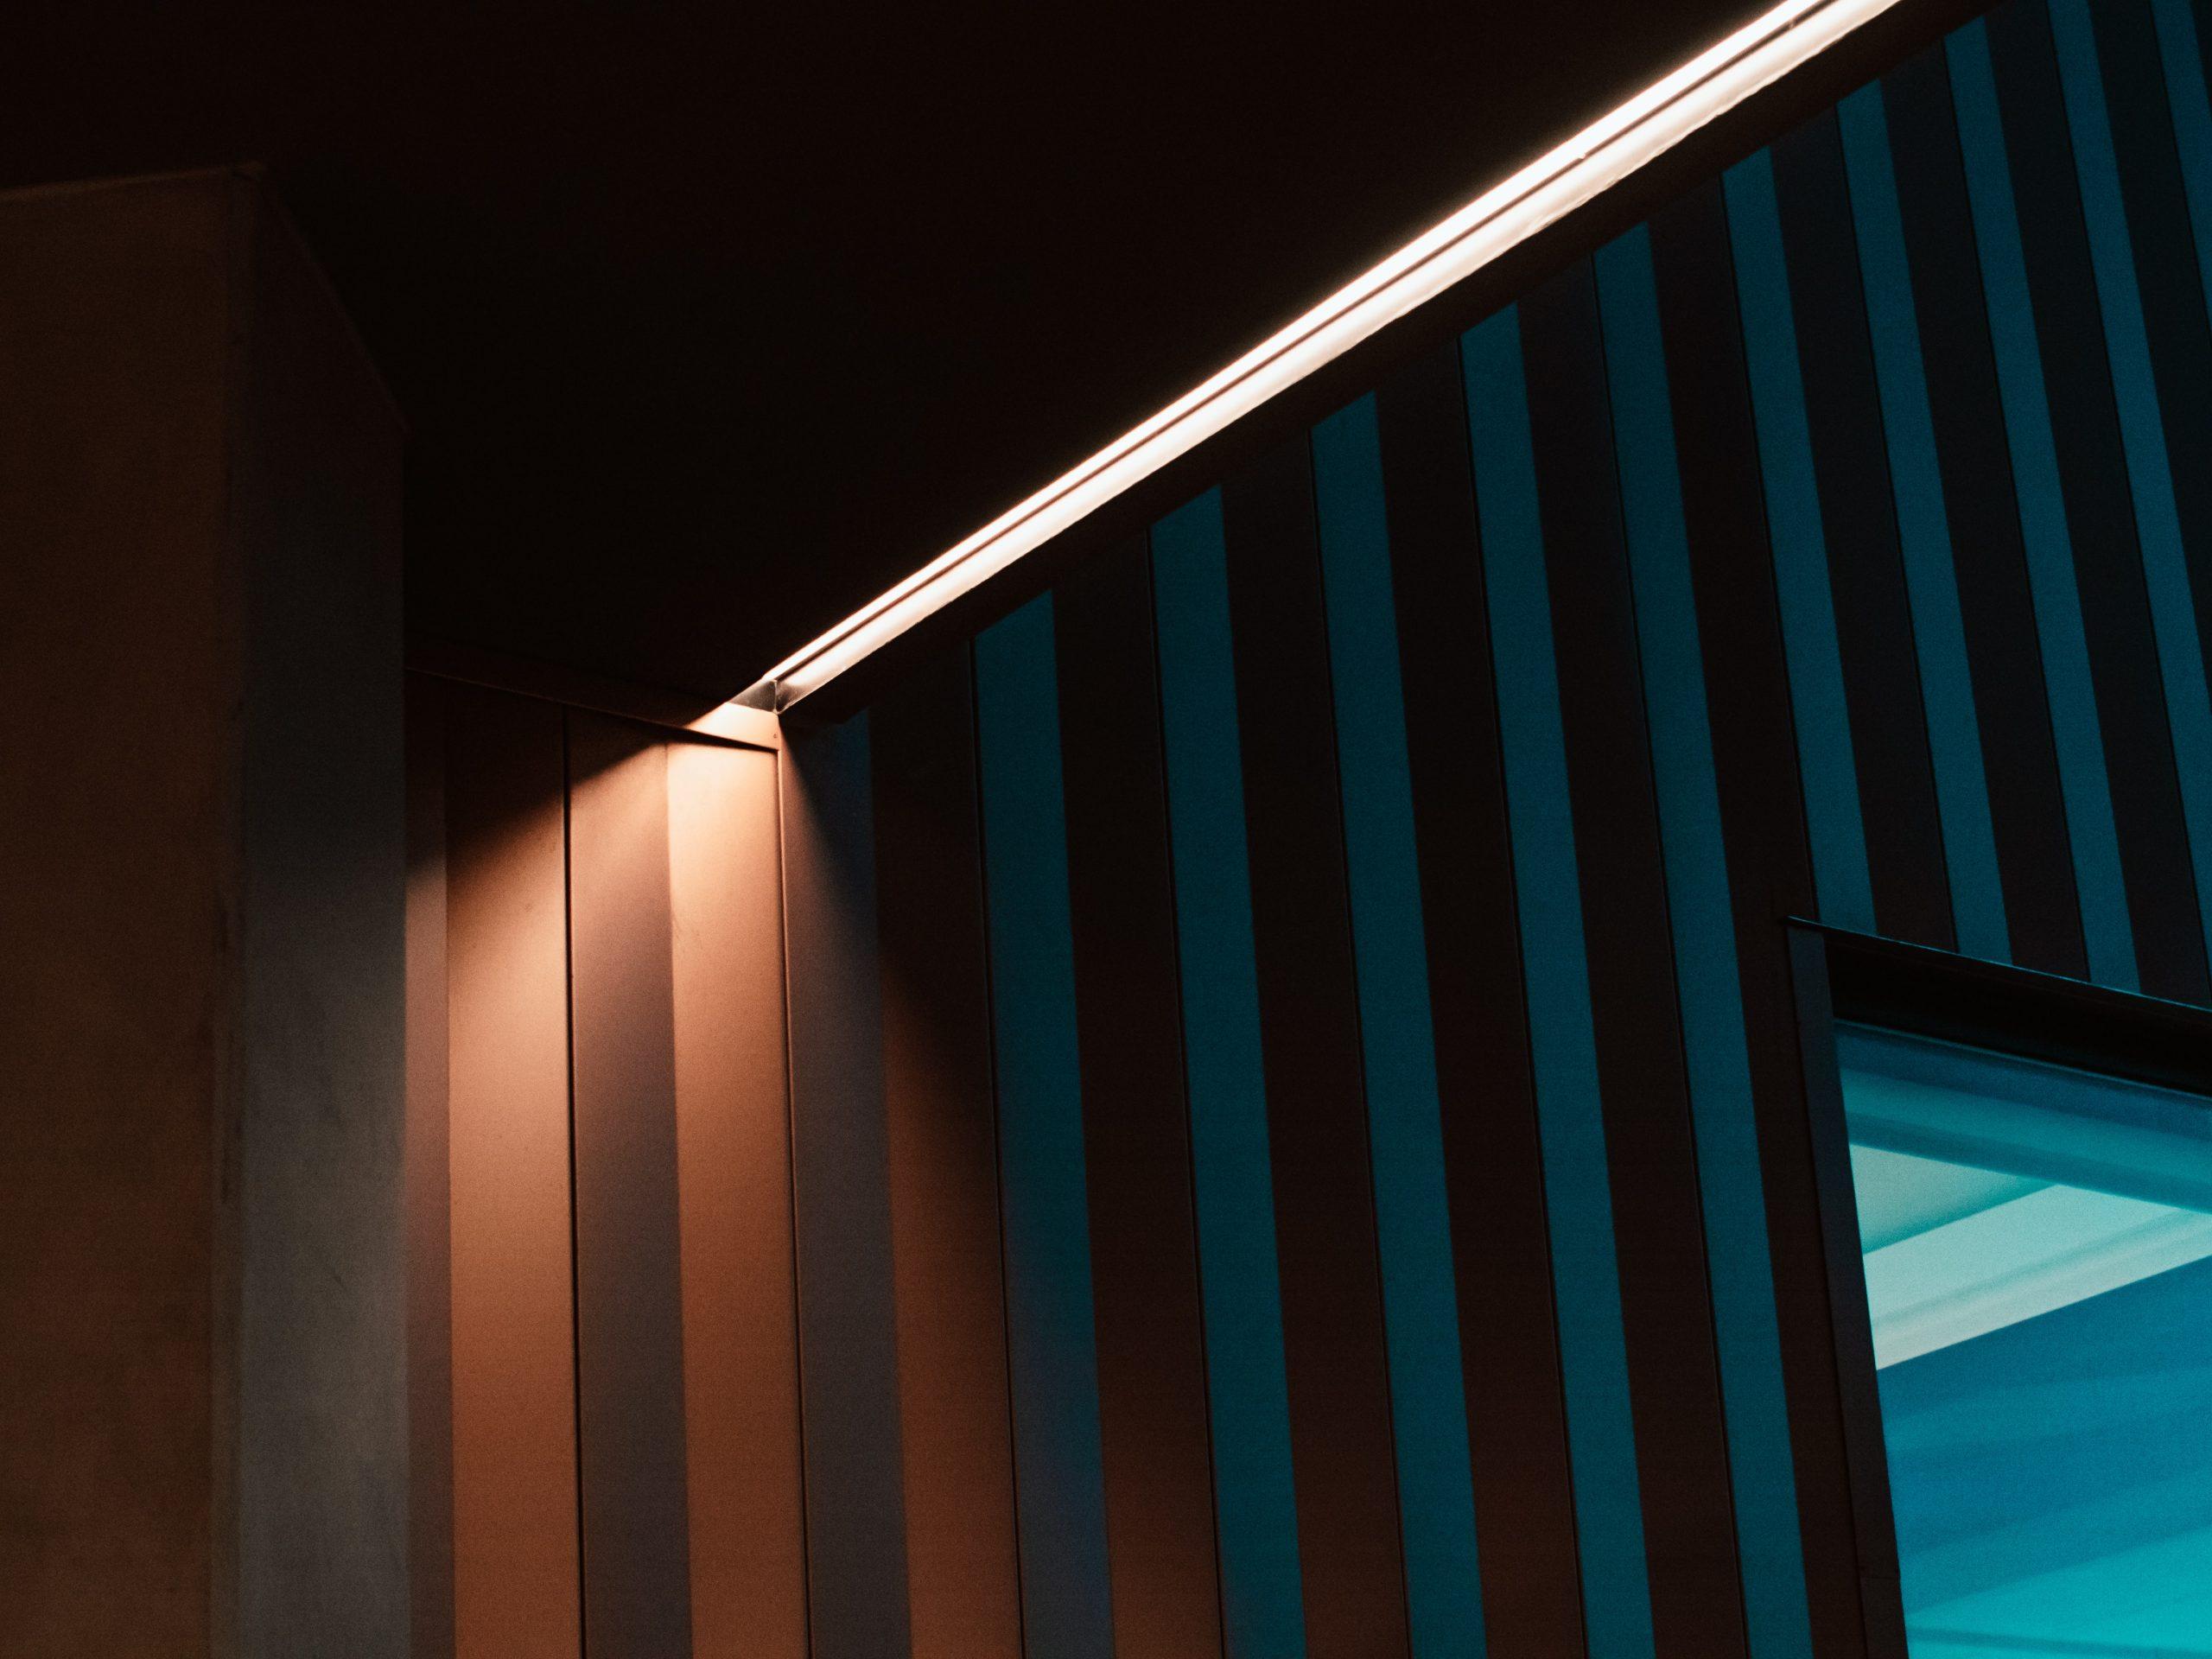 meritt thomas 1hBCbpmsqRs unsplash scaled - LED-paneler er populære i private hjem og virksomheder